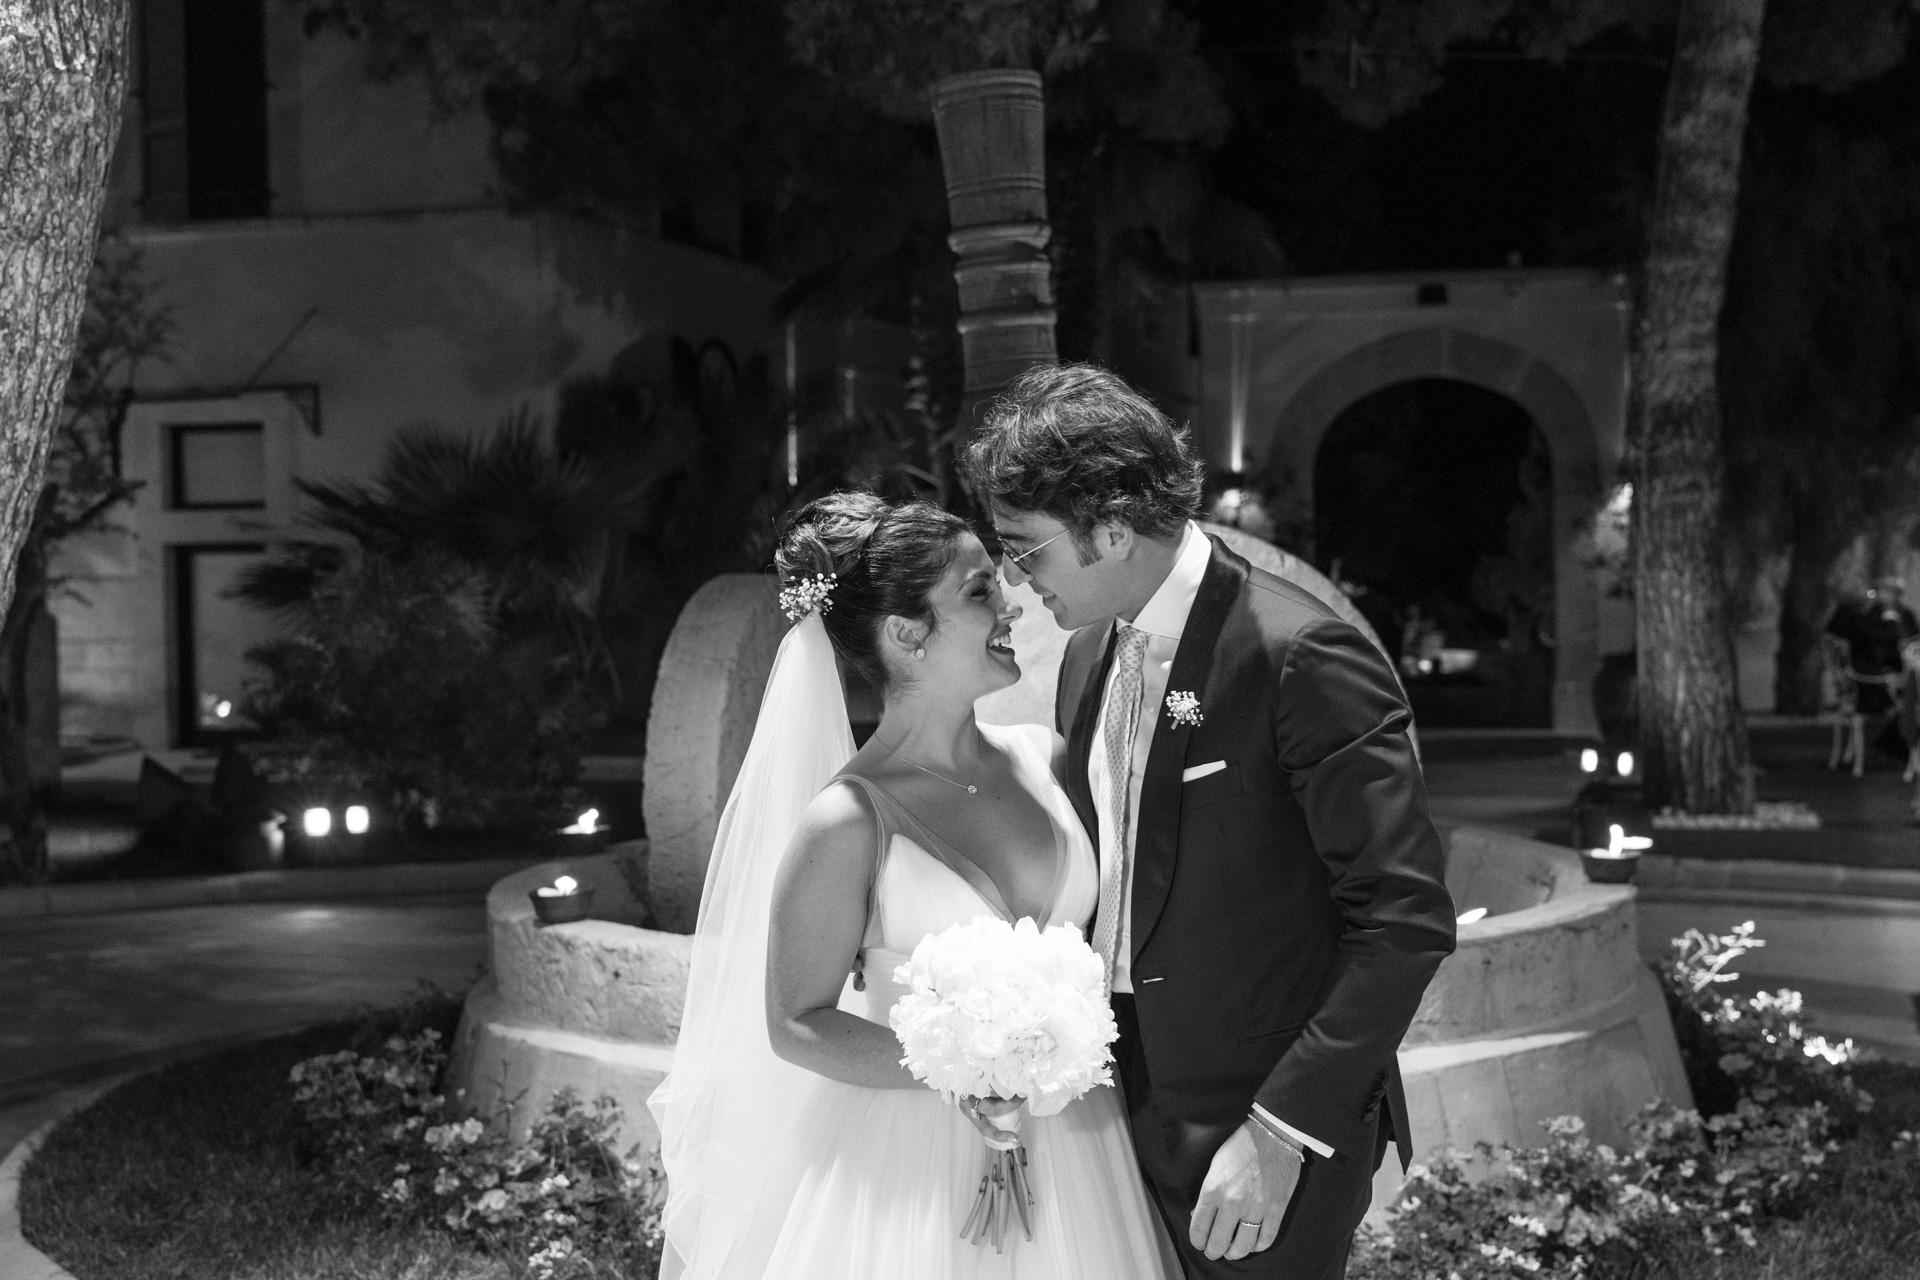 merafina photographer alfonso merafina fotografo wedding matrimonio andria francesca e antonio (20)